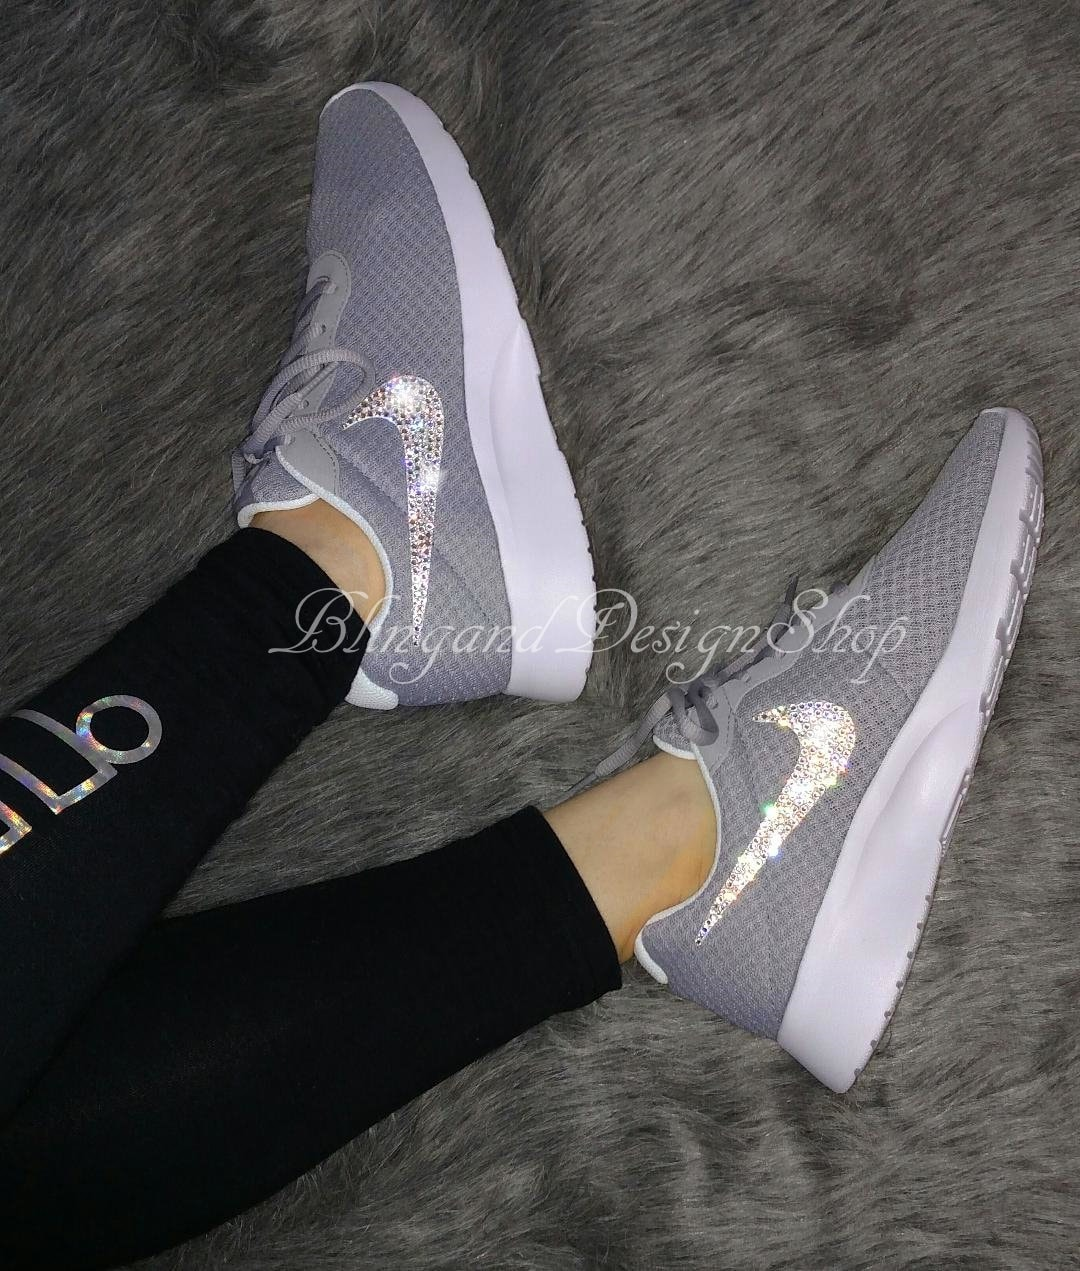 Swarovski Bling Nike Tanjun Women's Nike Shoes Customized with Crystal  Swarovski Rhinestones, Sneakers, Tennis Shoes